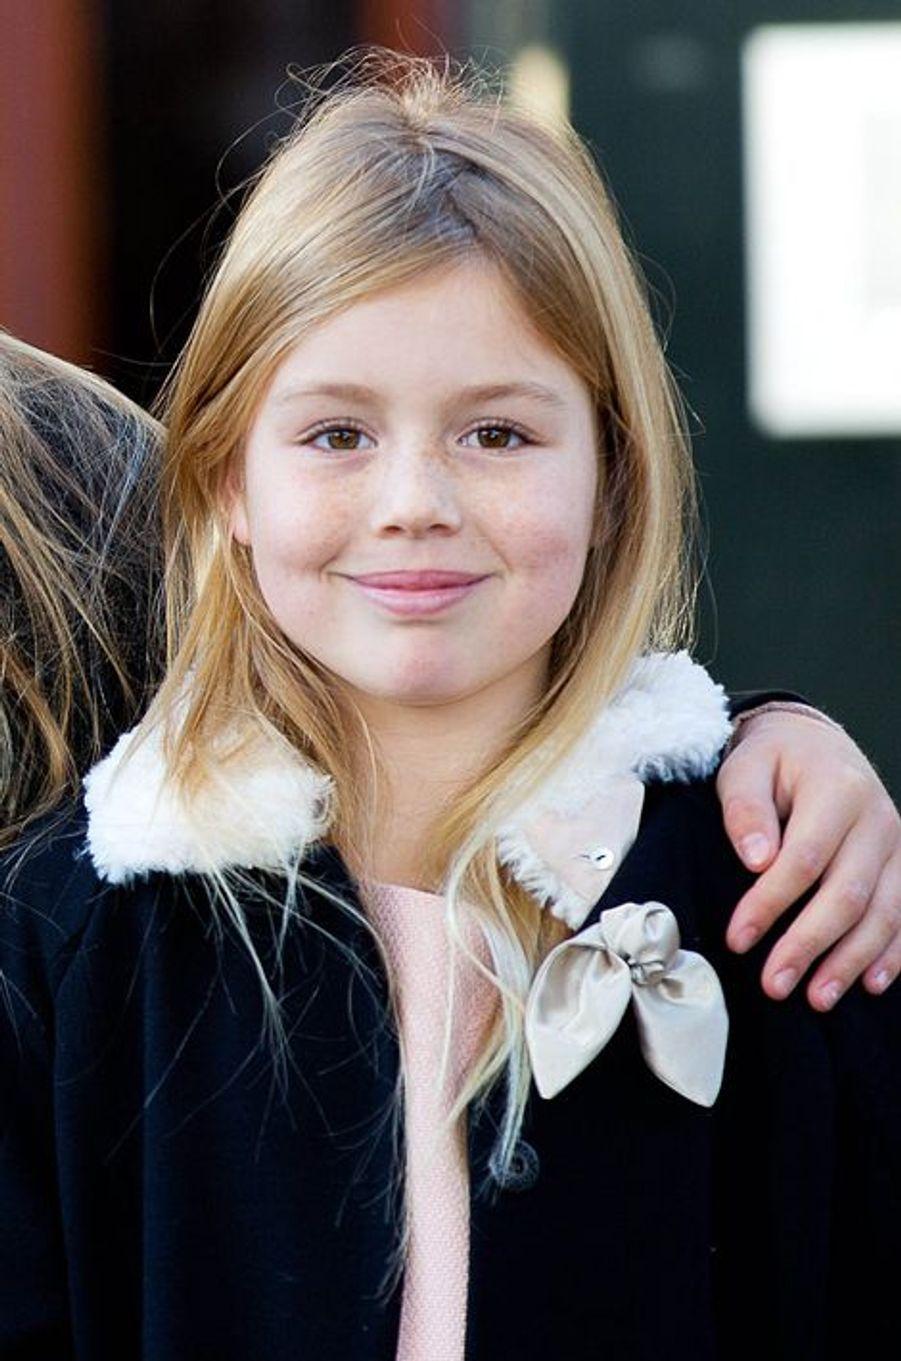 La princesse Alexia, le 9 novembre 2014